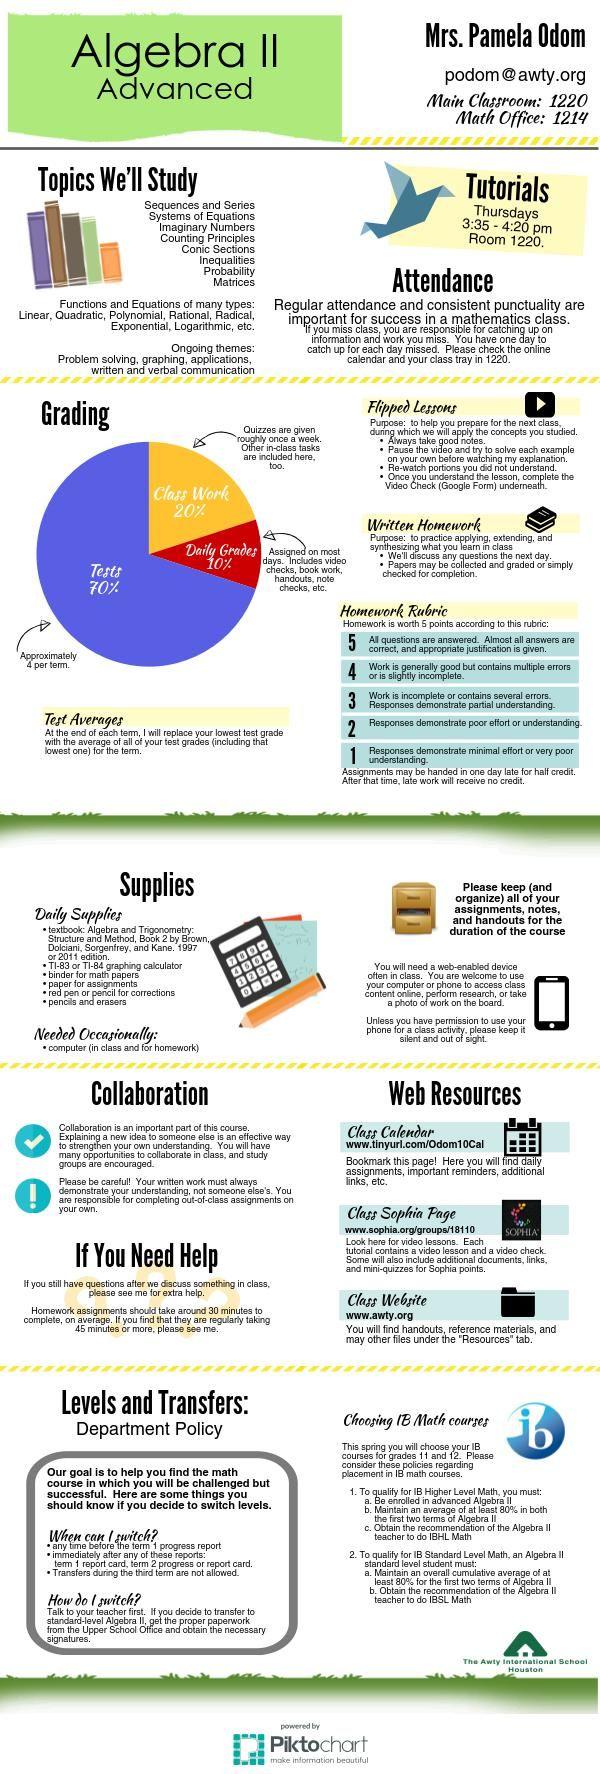 Alg II Syllabus | Piktochart Infographic Editor